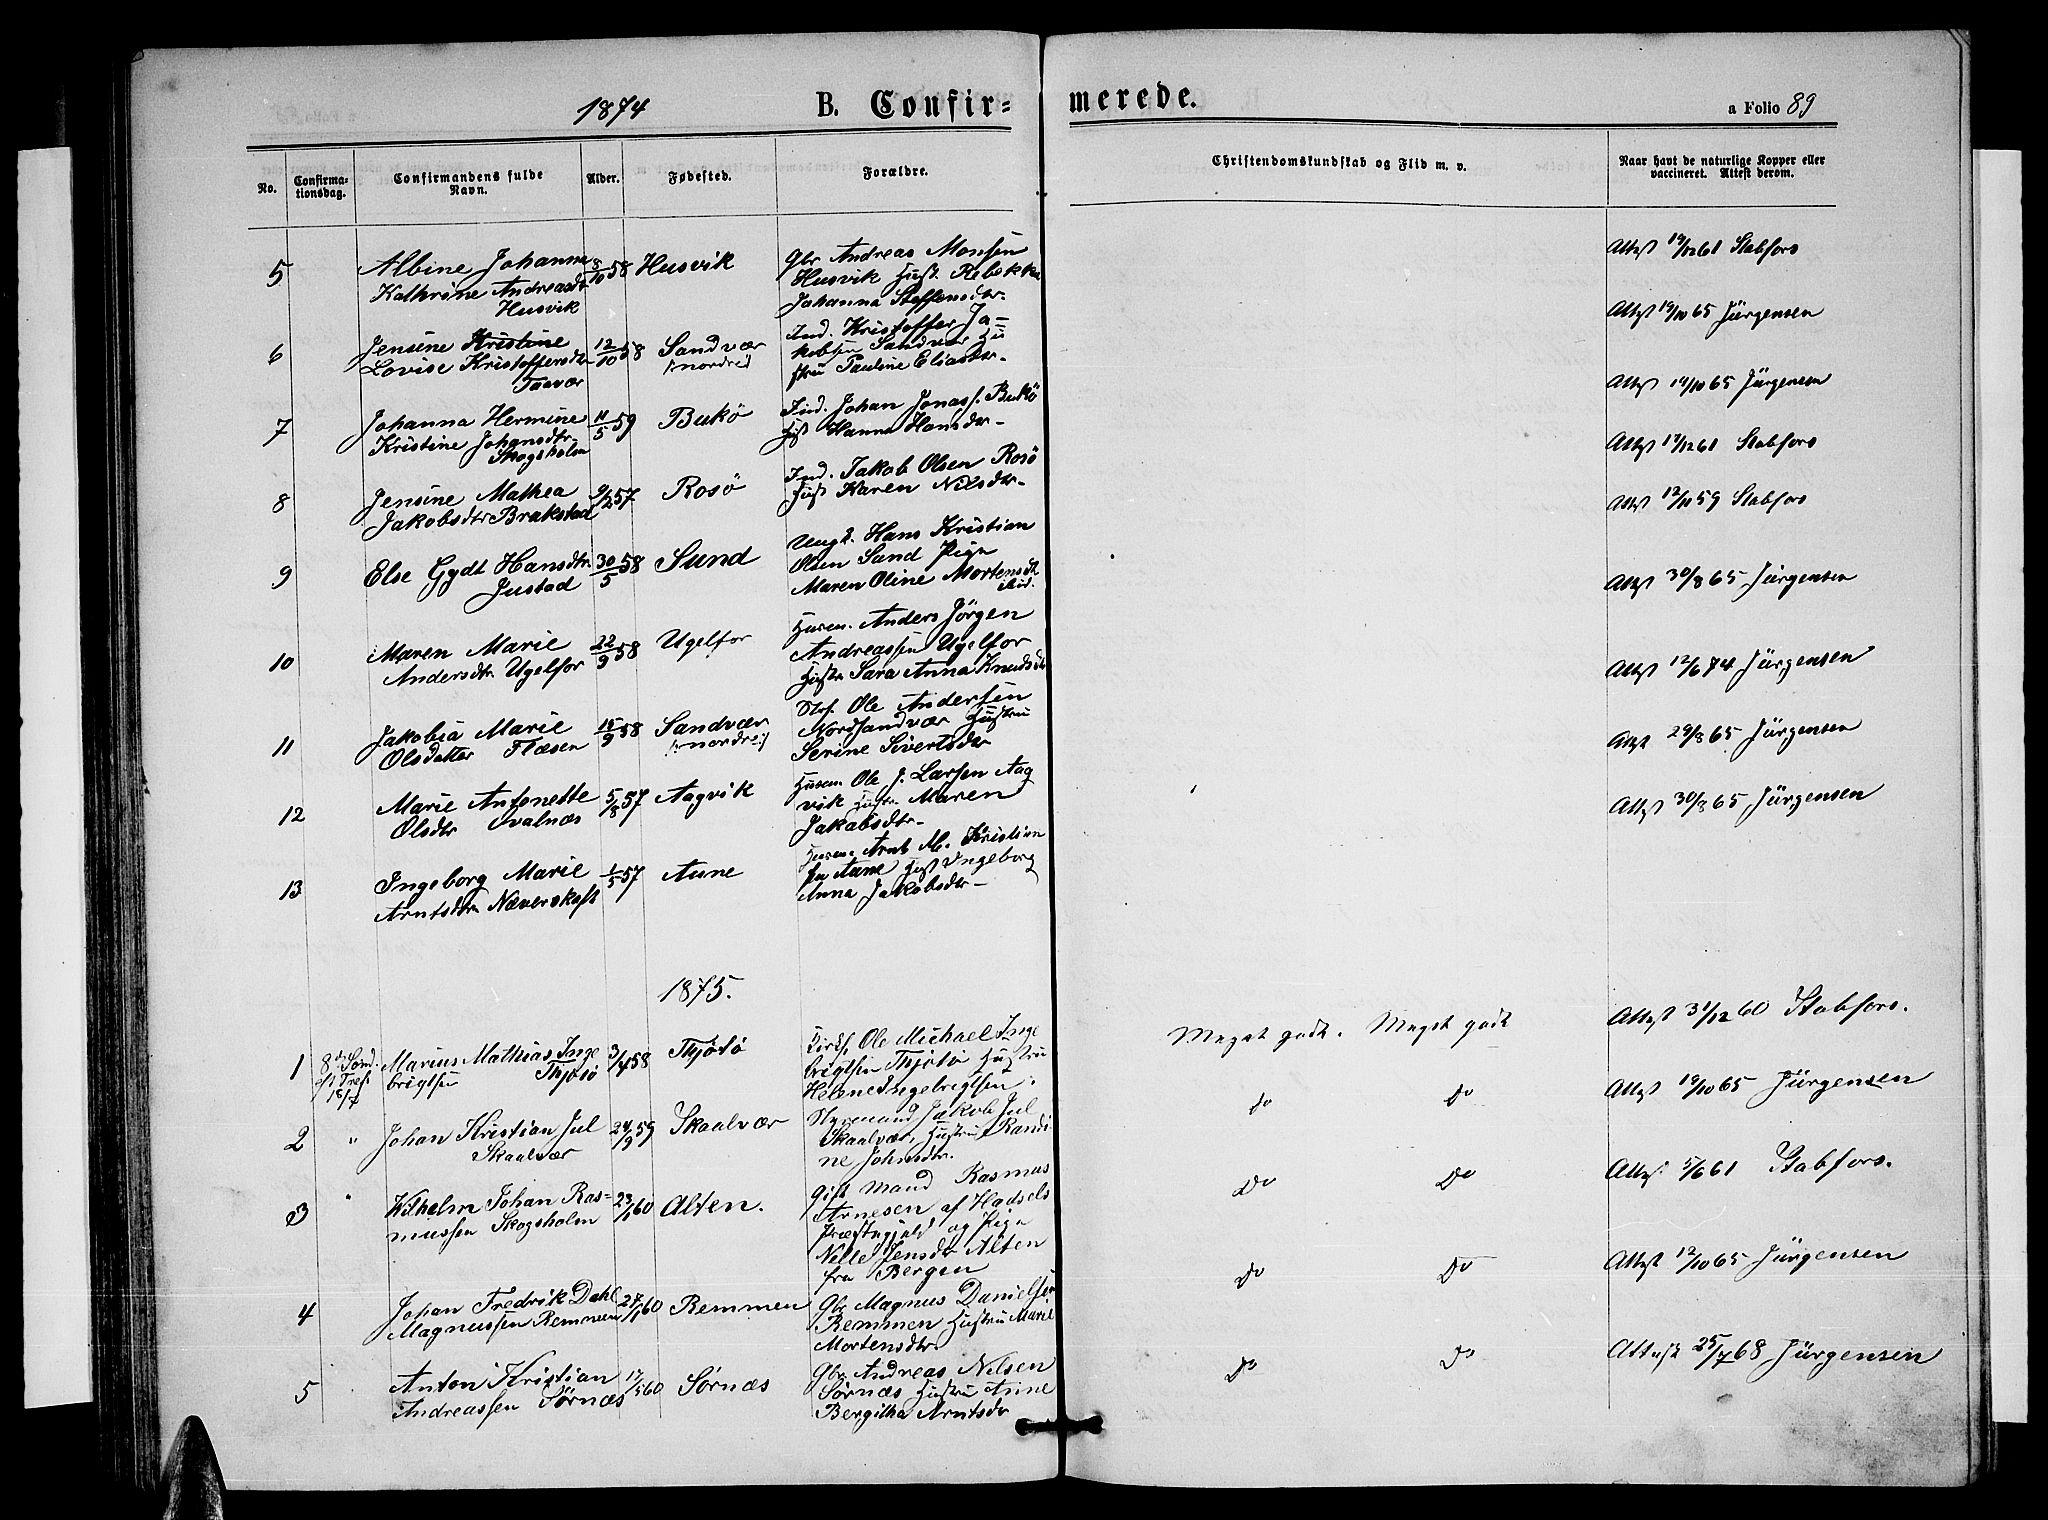 SAT, Ministerialprotokoller, klokkerbøker og fødselsregistre - Nordland, 817/L0267: Klokkerbok nr. 817C02, 1870-1883, s. 89